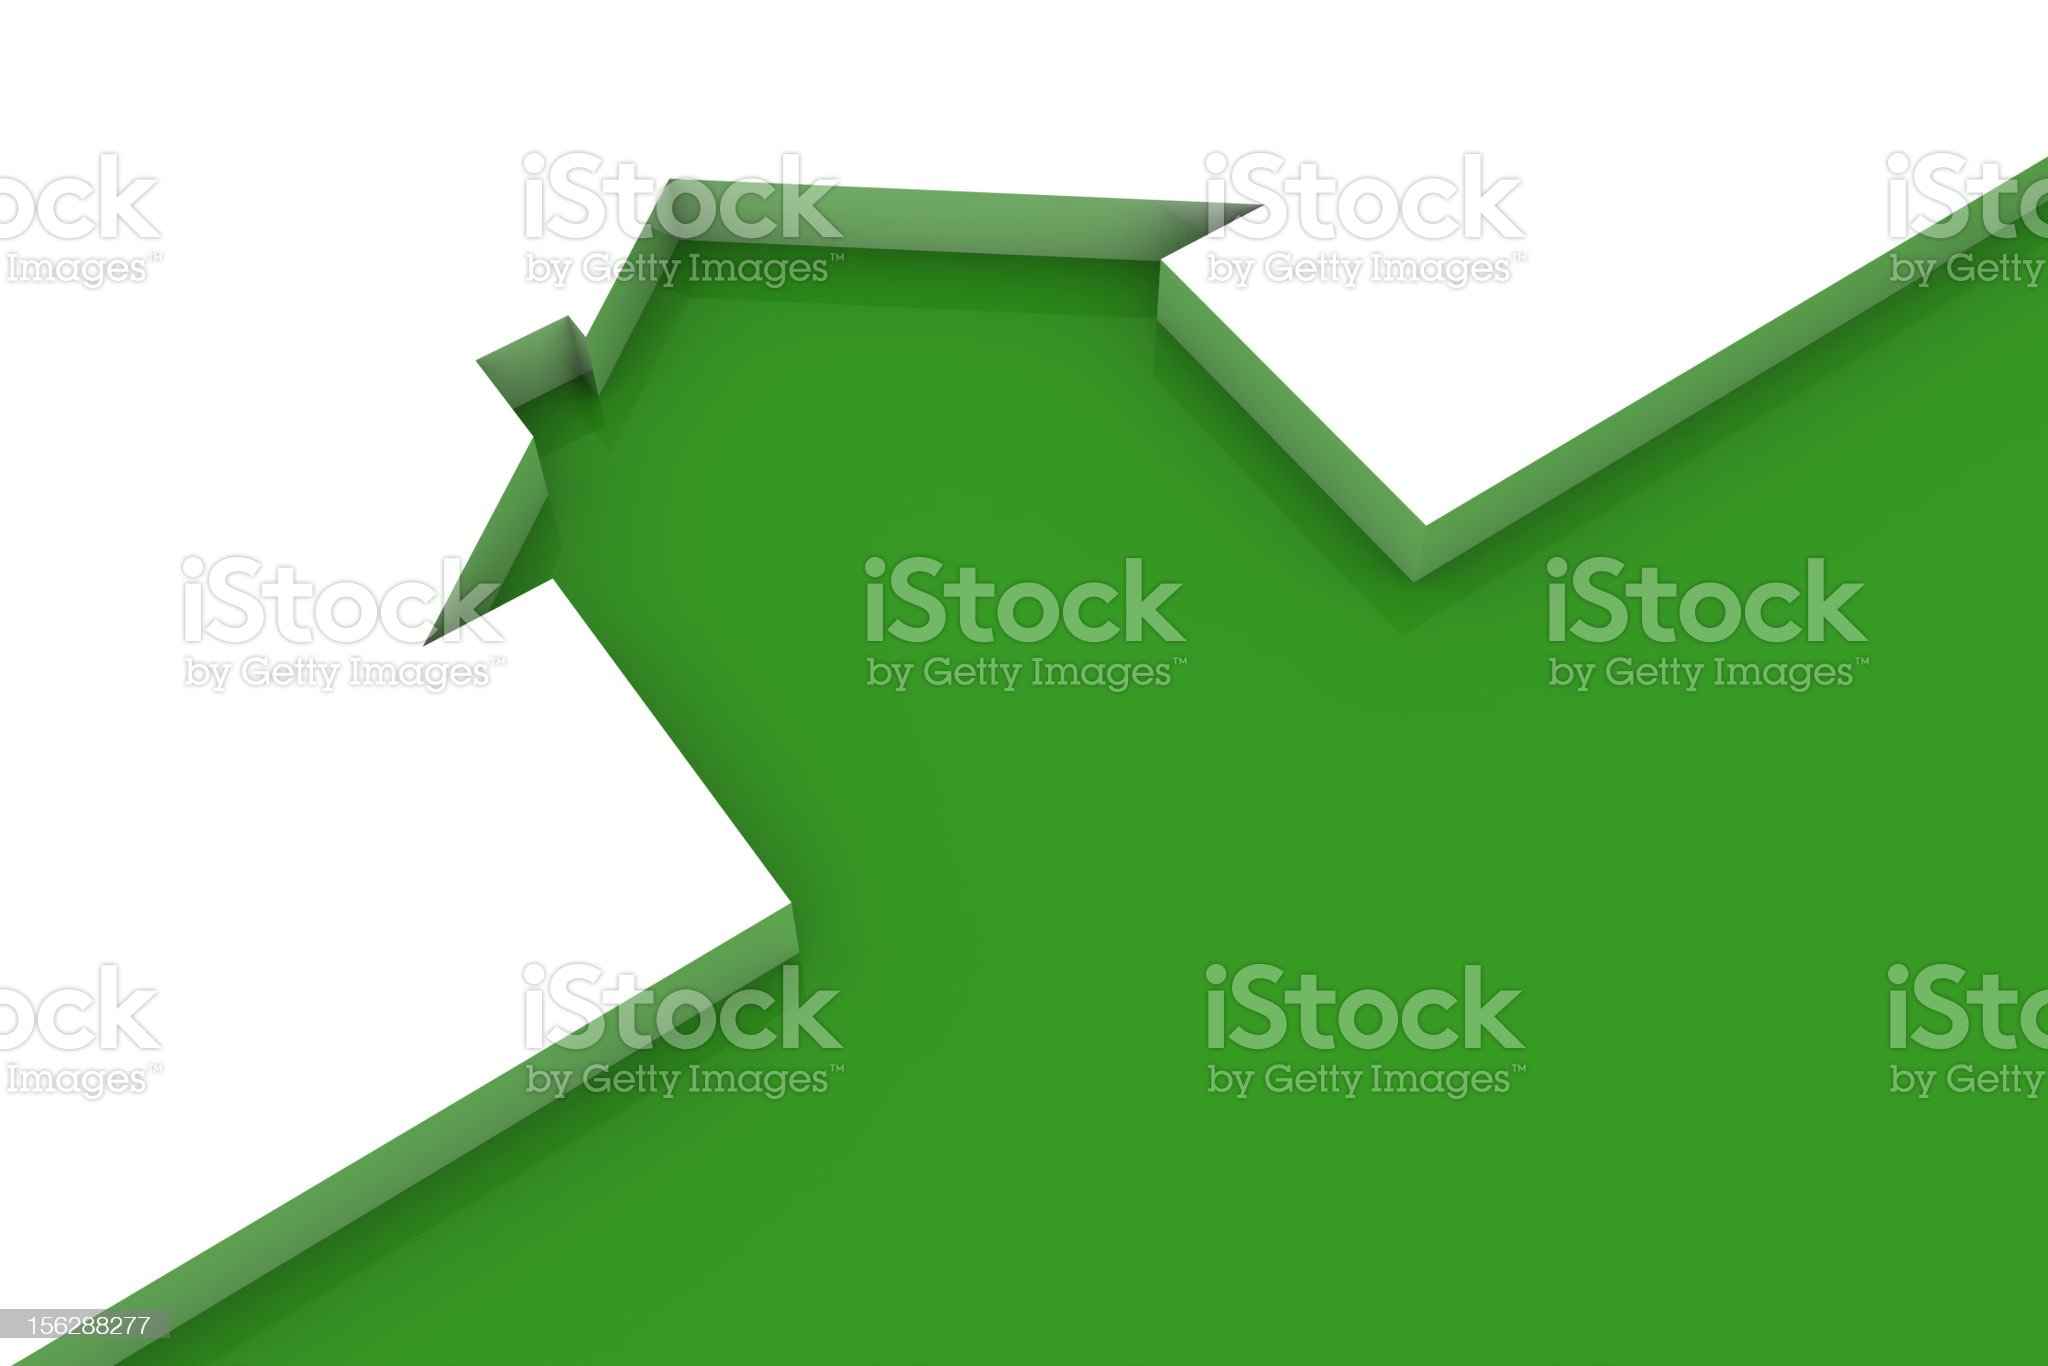 Ecologic home (green outline on white) royalty-free stock vector art